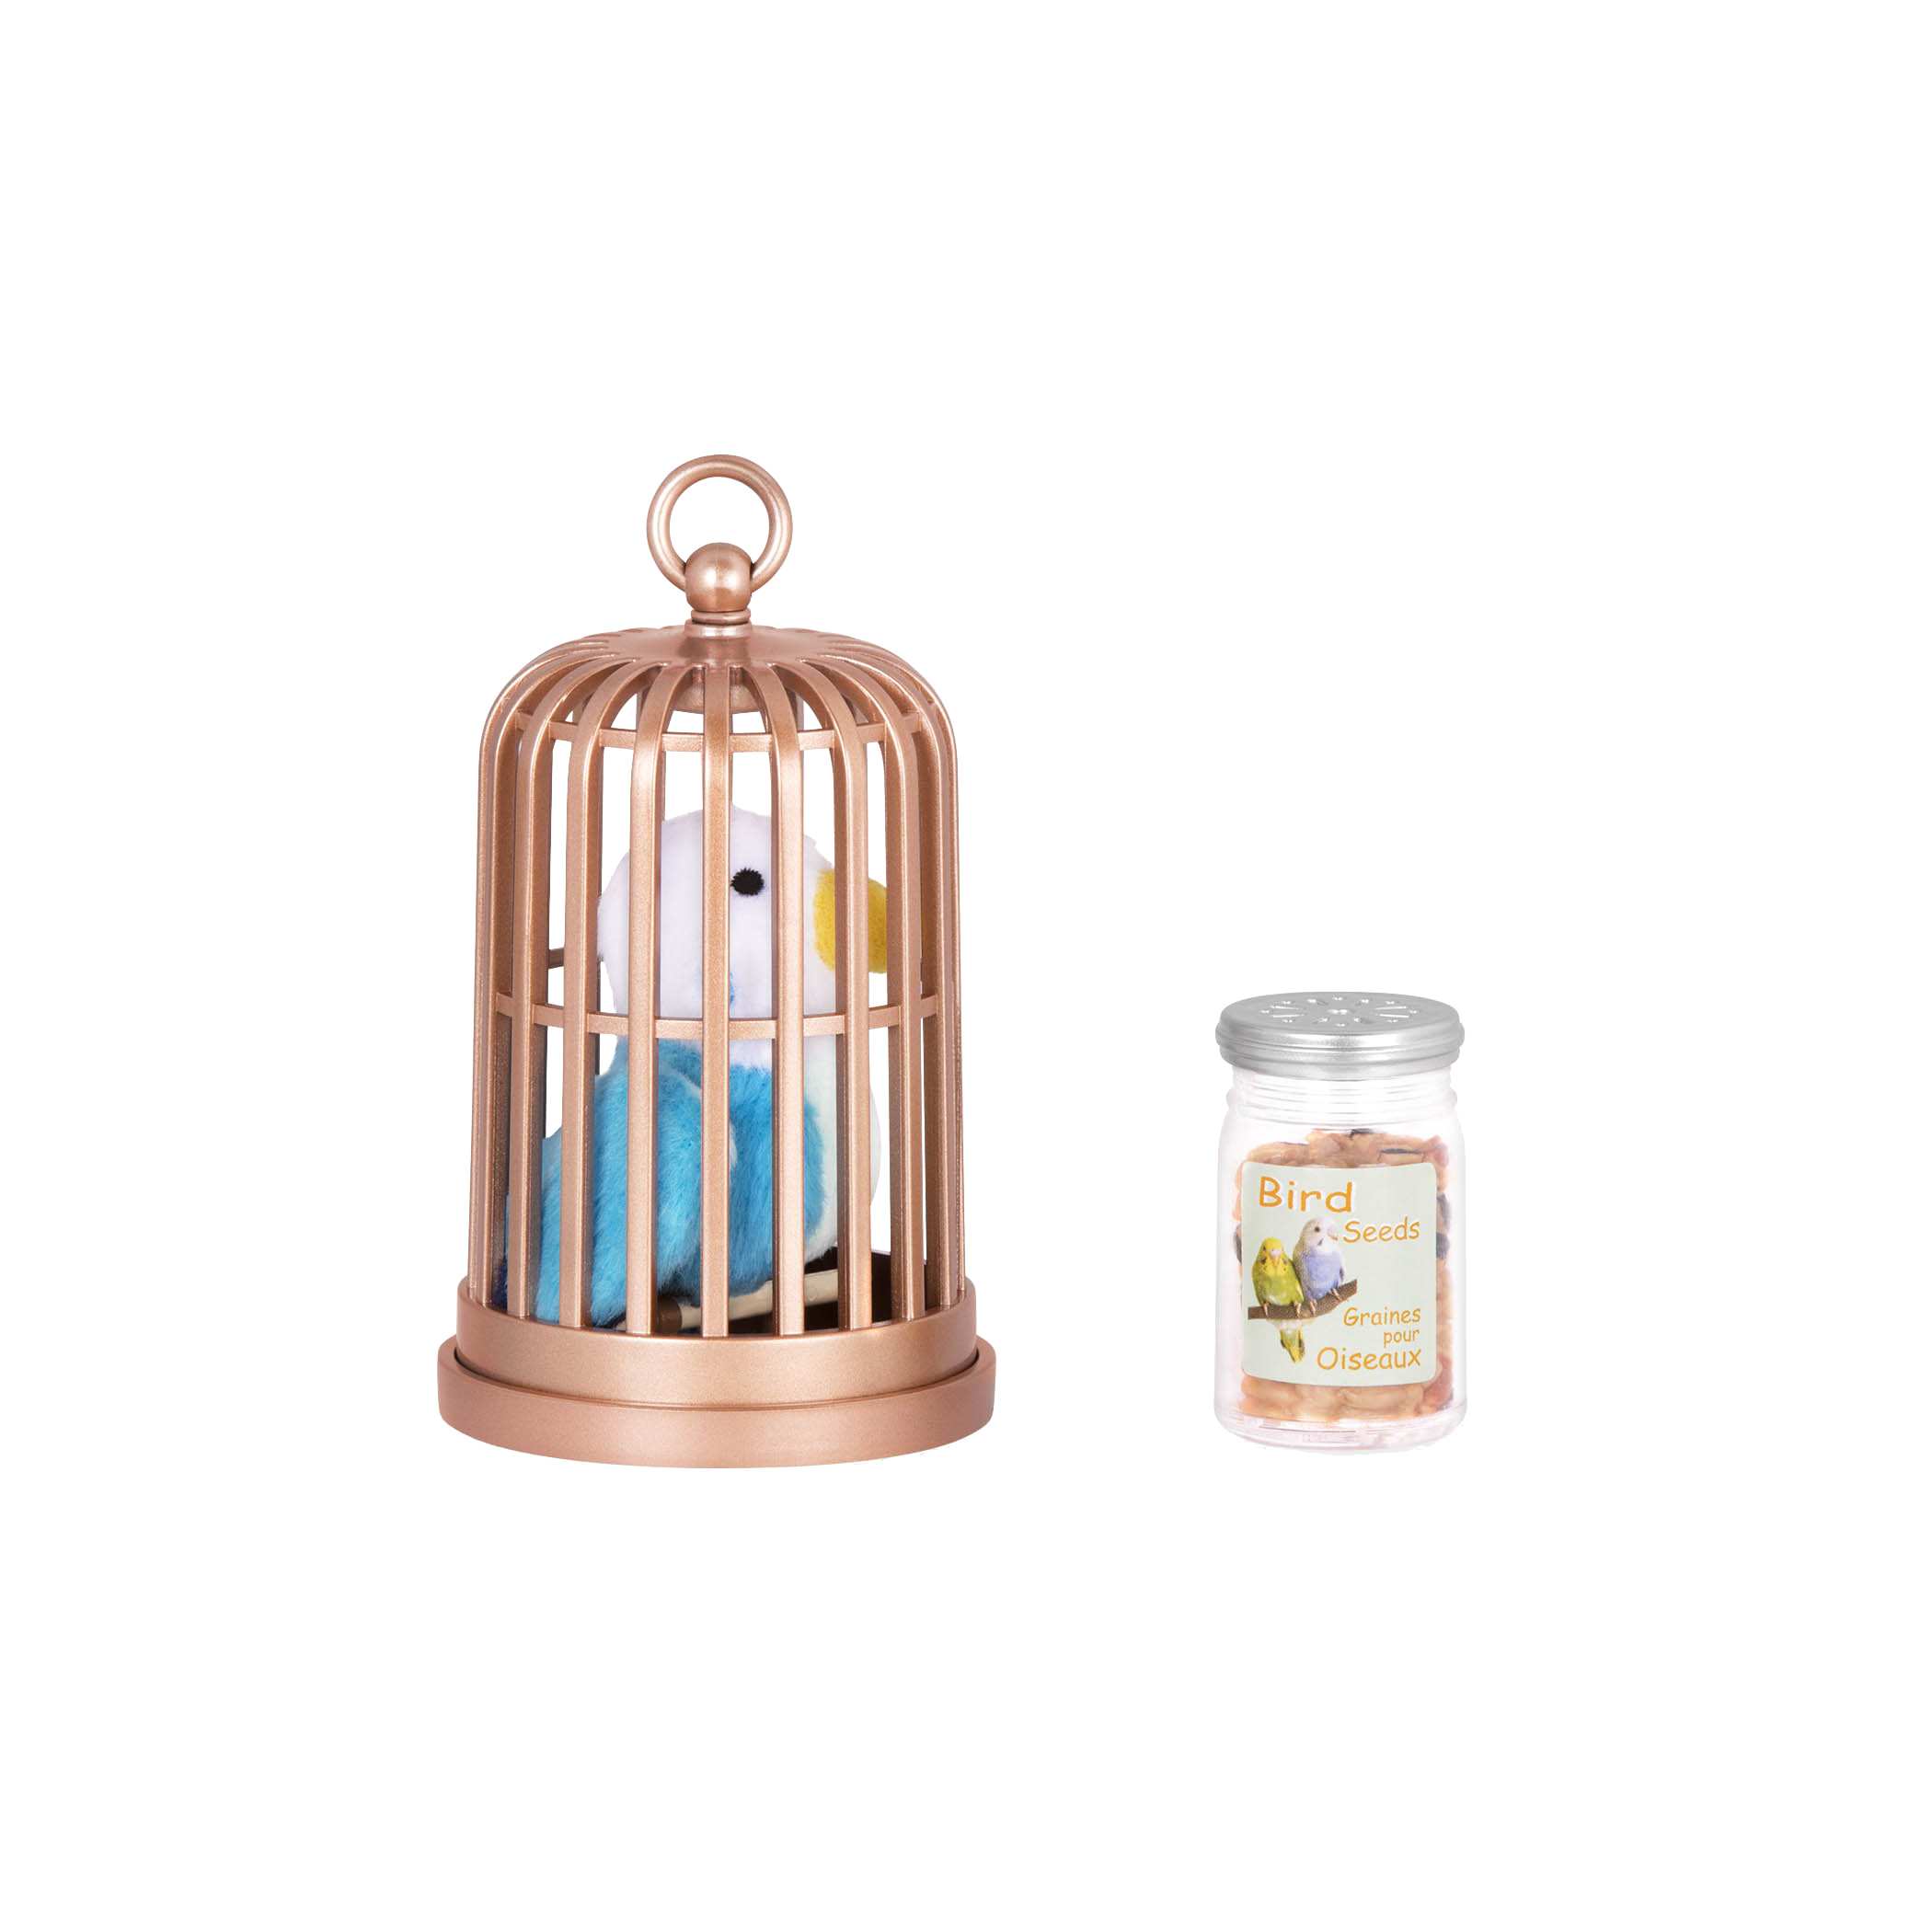 Bird inside cage